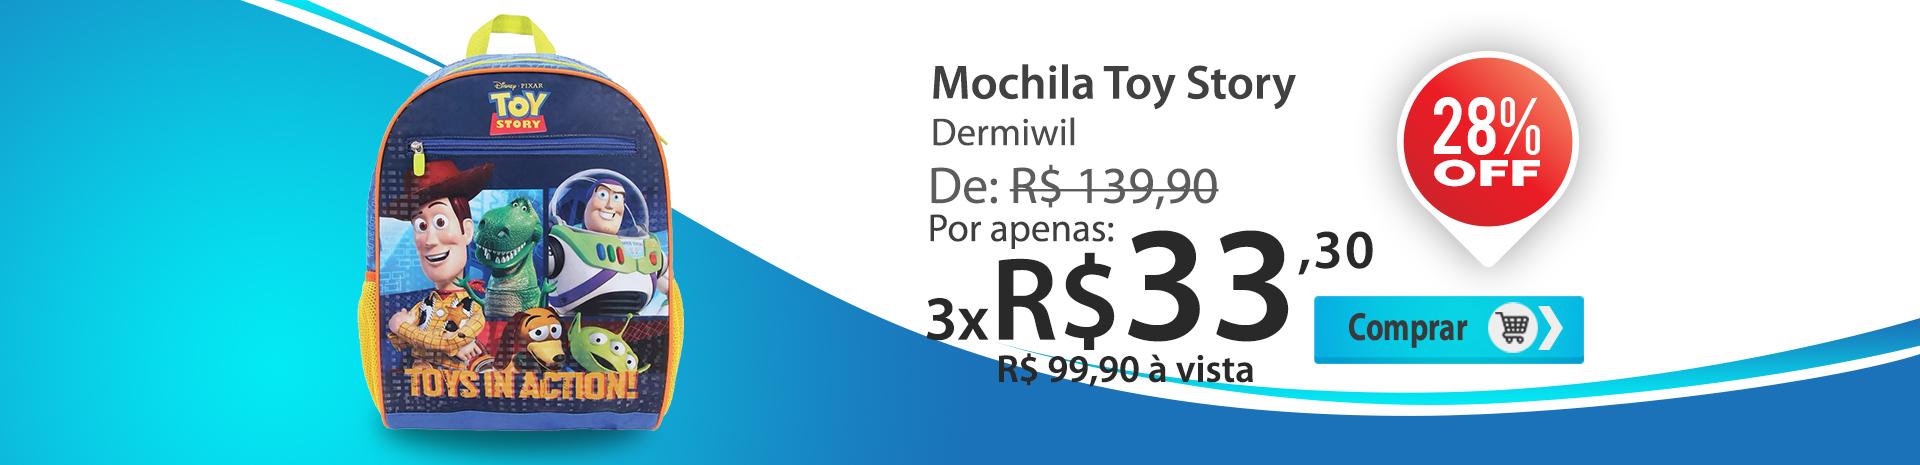 banner categoria mochila toy